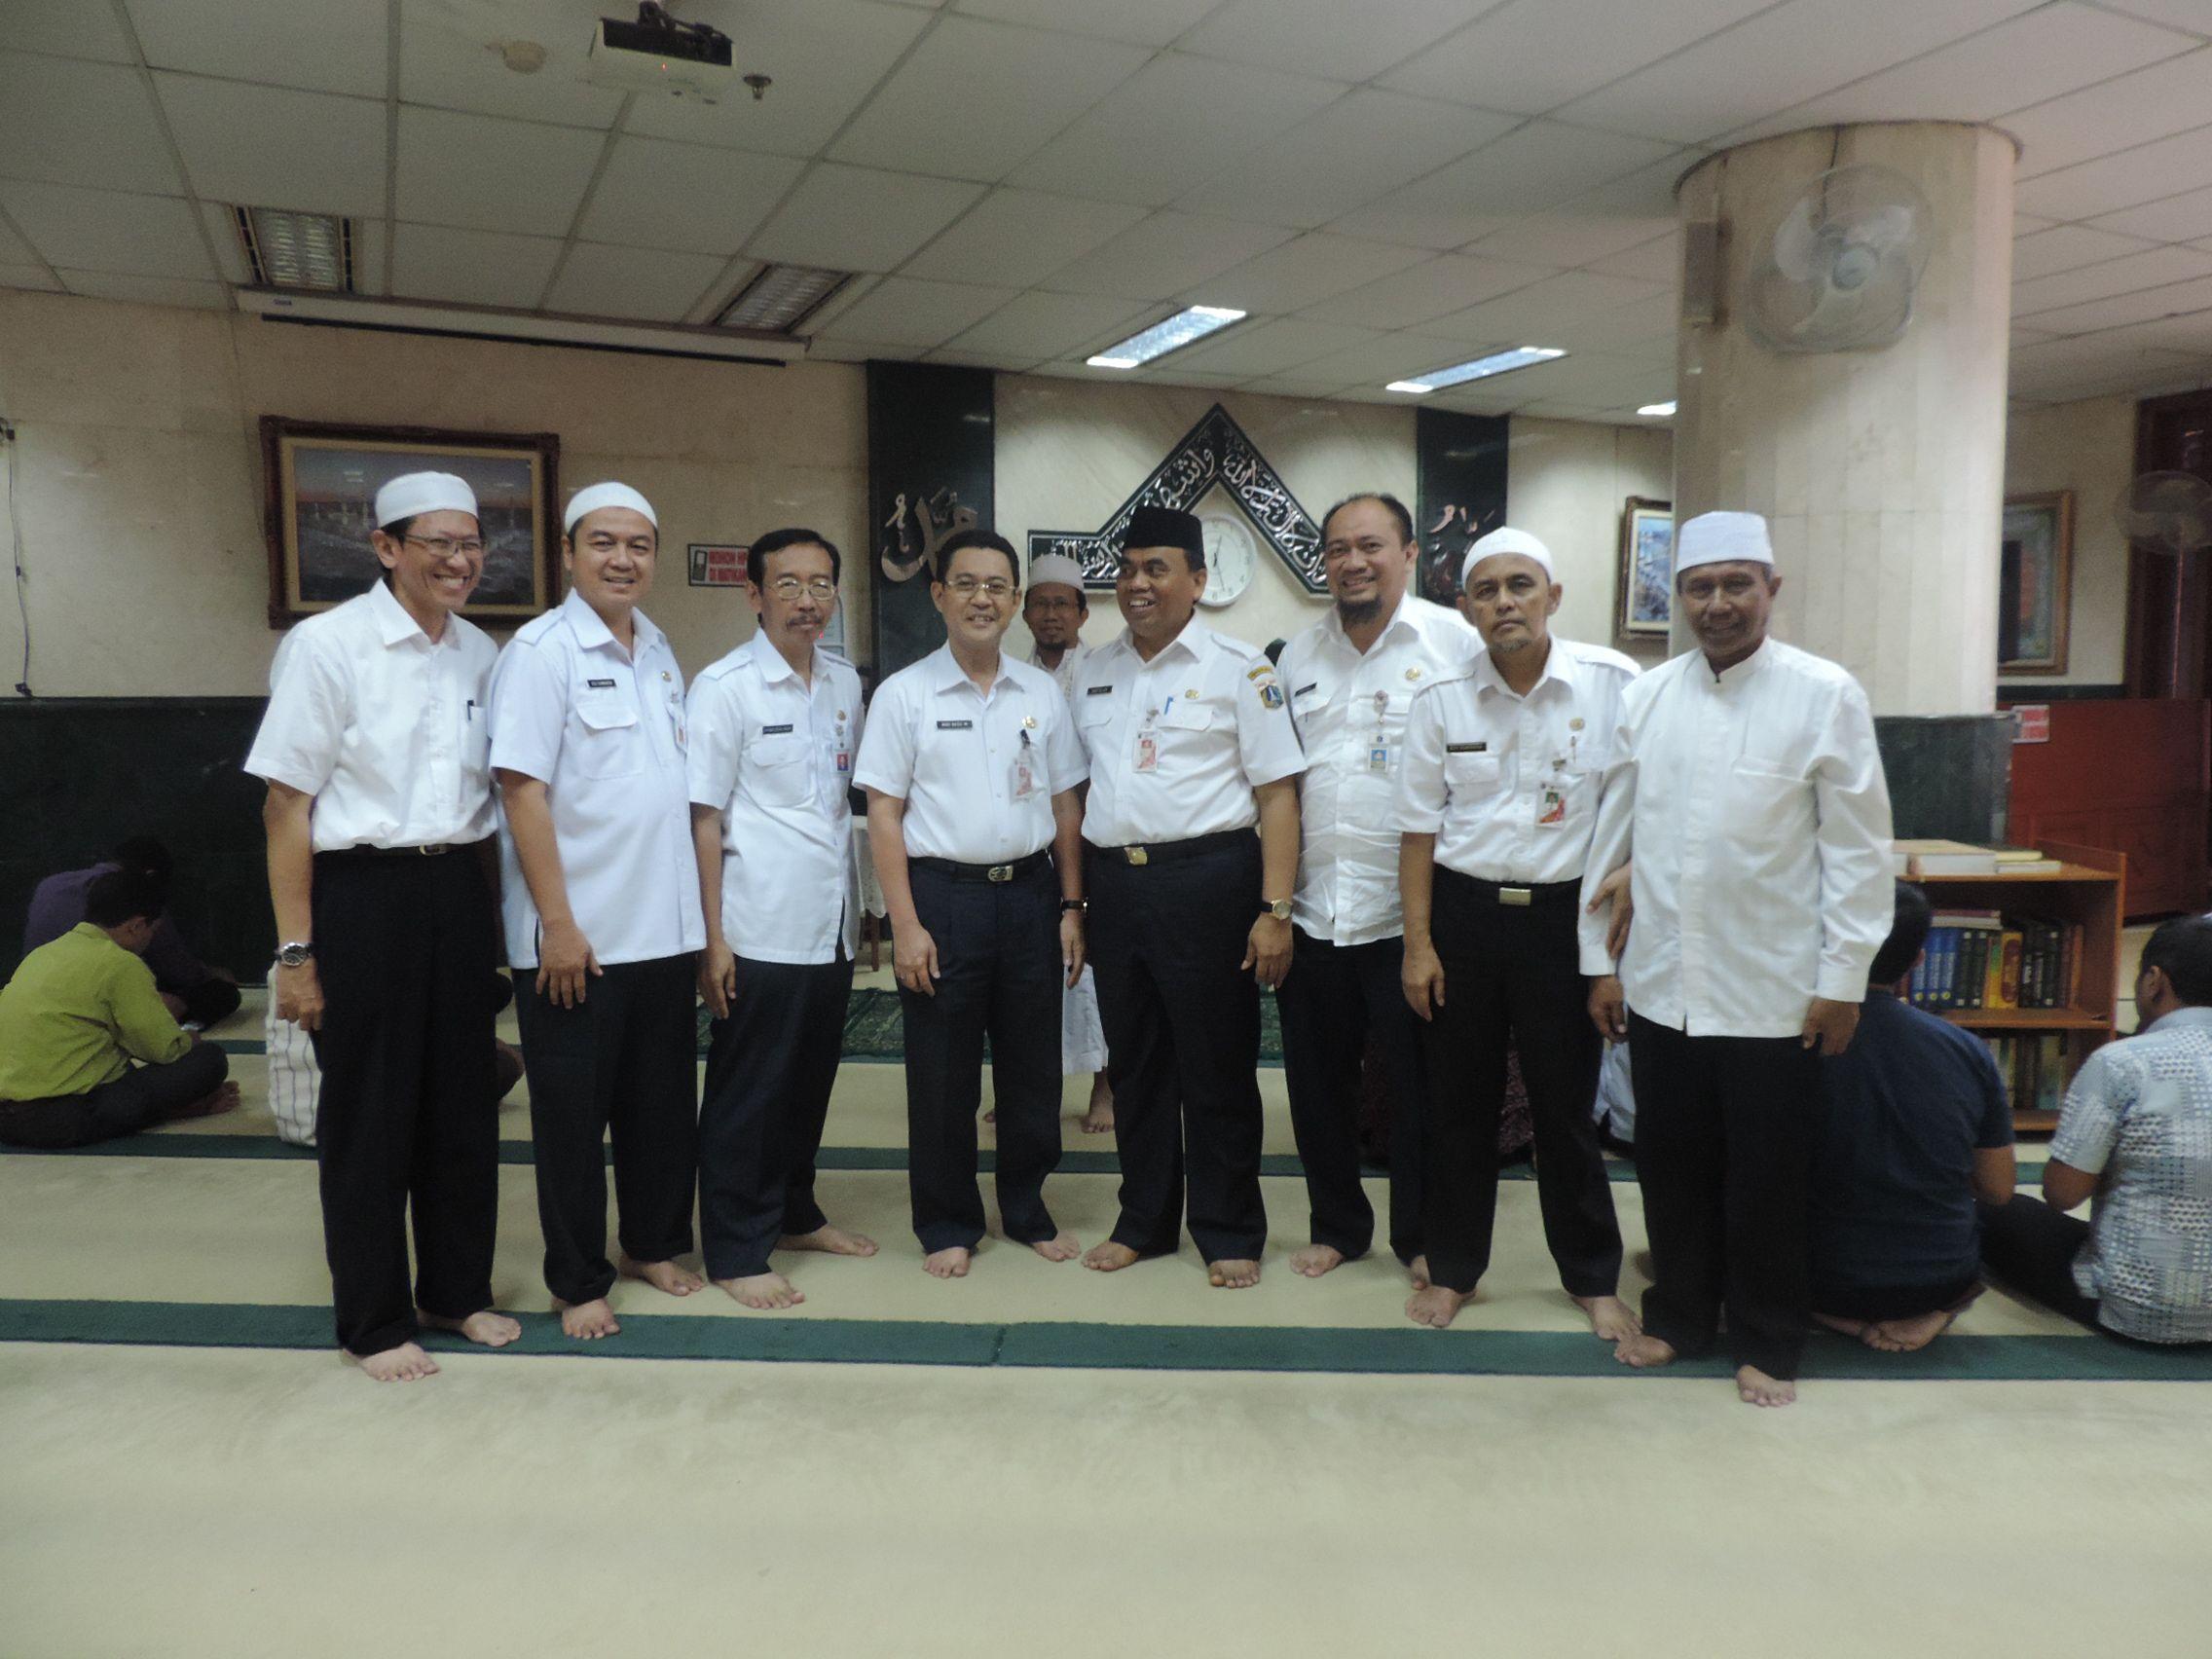 Wakil Kepala Dinas Pelayanan Pajak Foto bersama Sekda Provinsi DKI Jakarta Bapak Saefulloh di Masjid Al-Badr Abdul Muis Jakarta Pusat